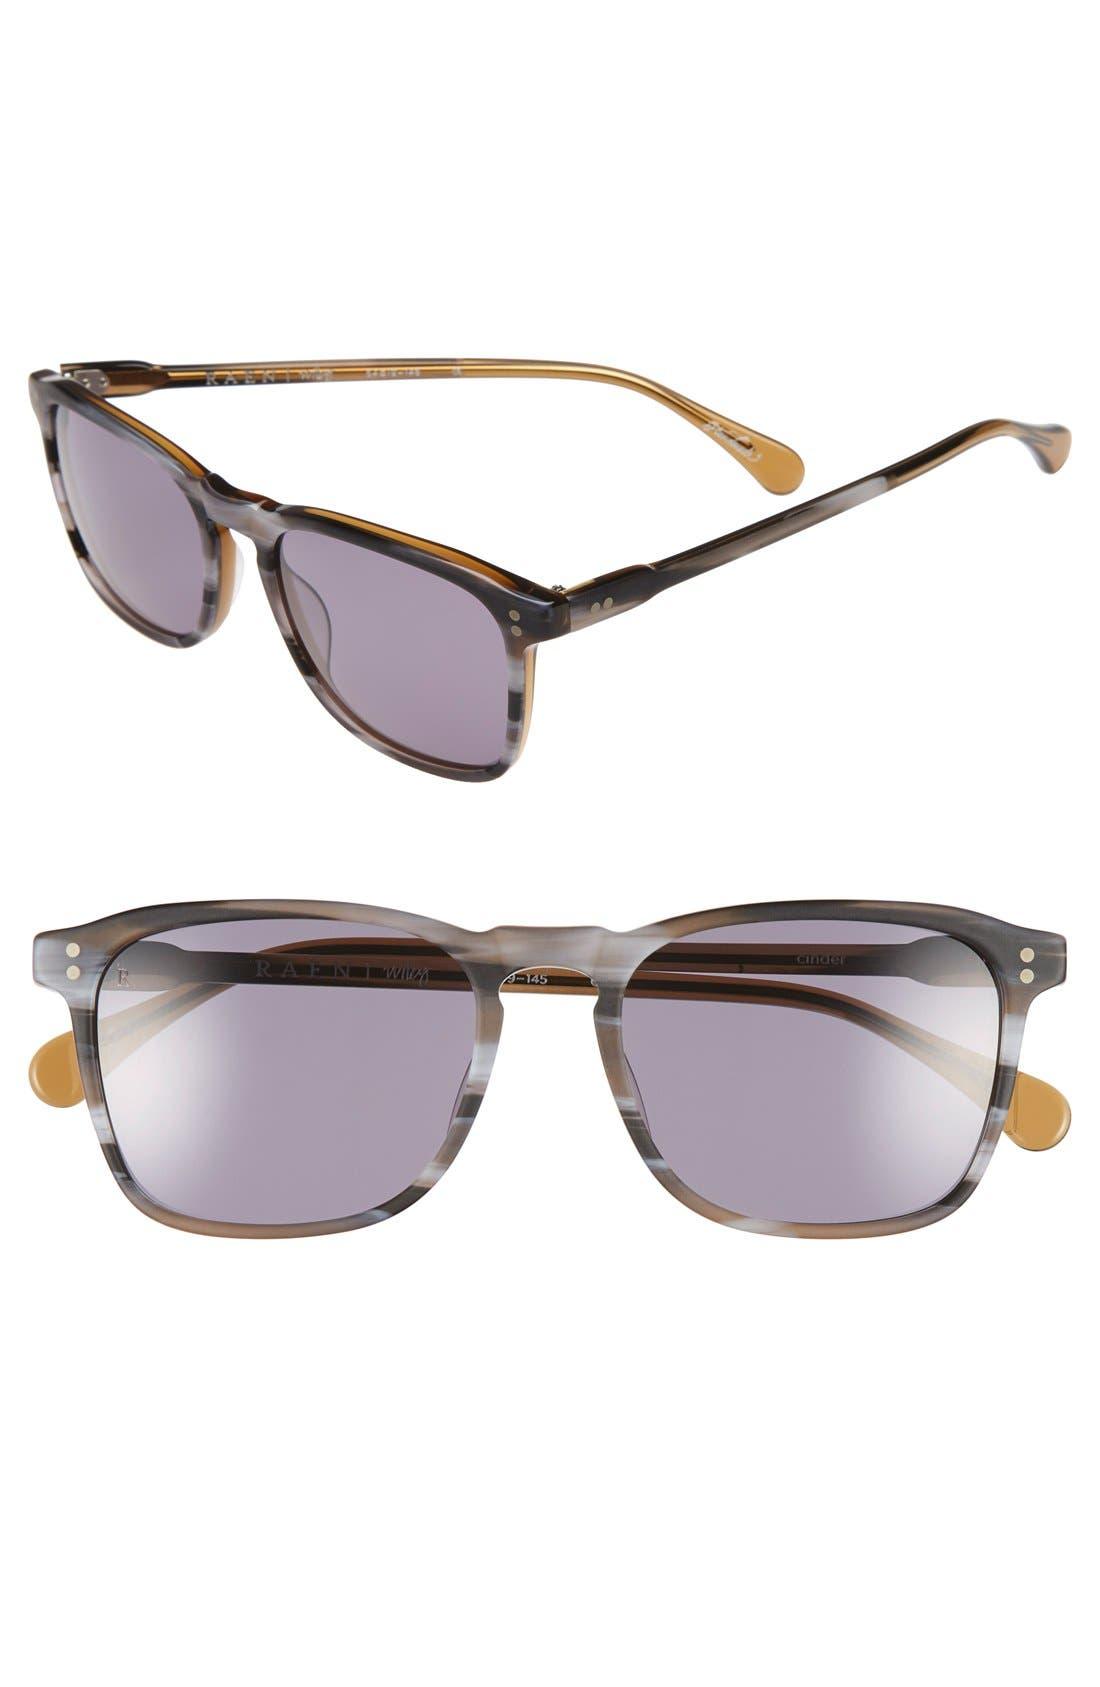 RAEN 'Wiley' 54mm Sunglasses